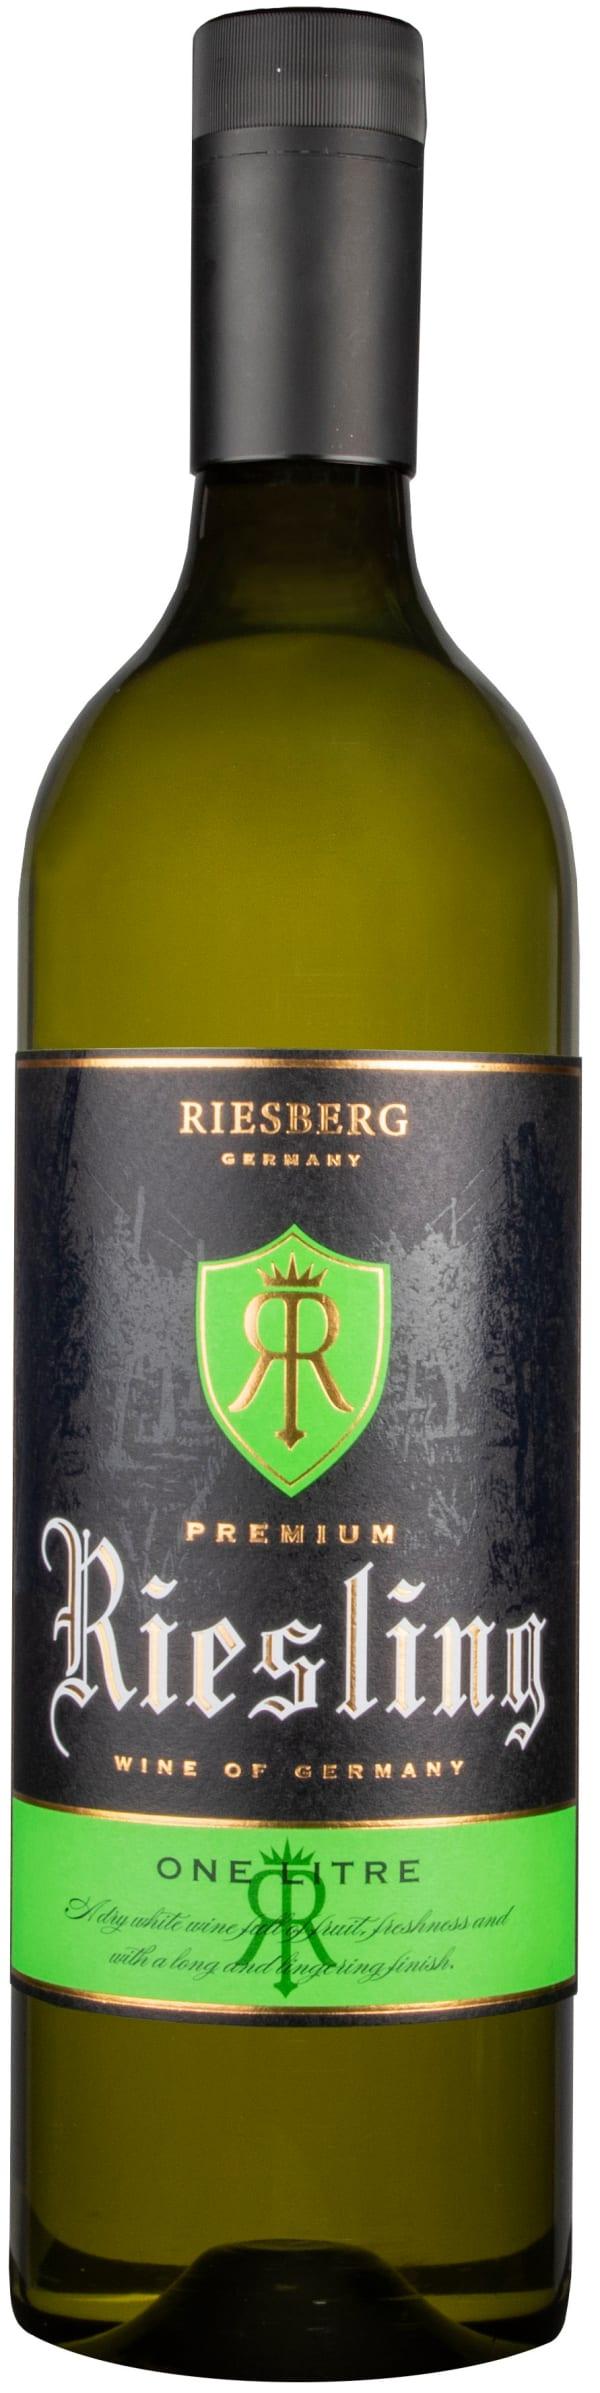 Riesberg Premium Riesling 2019 plastflaska